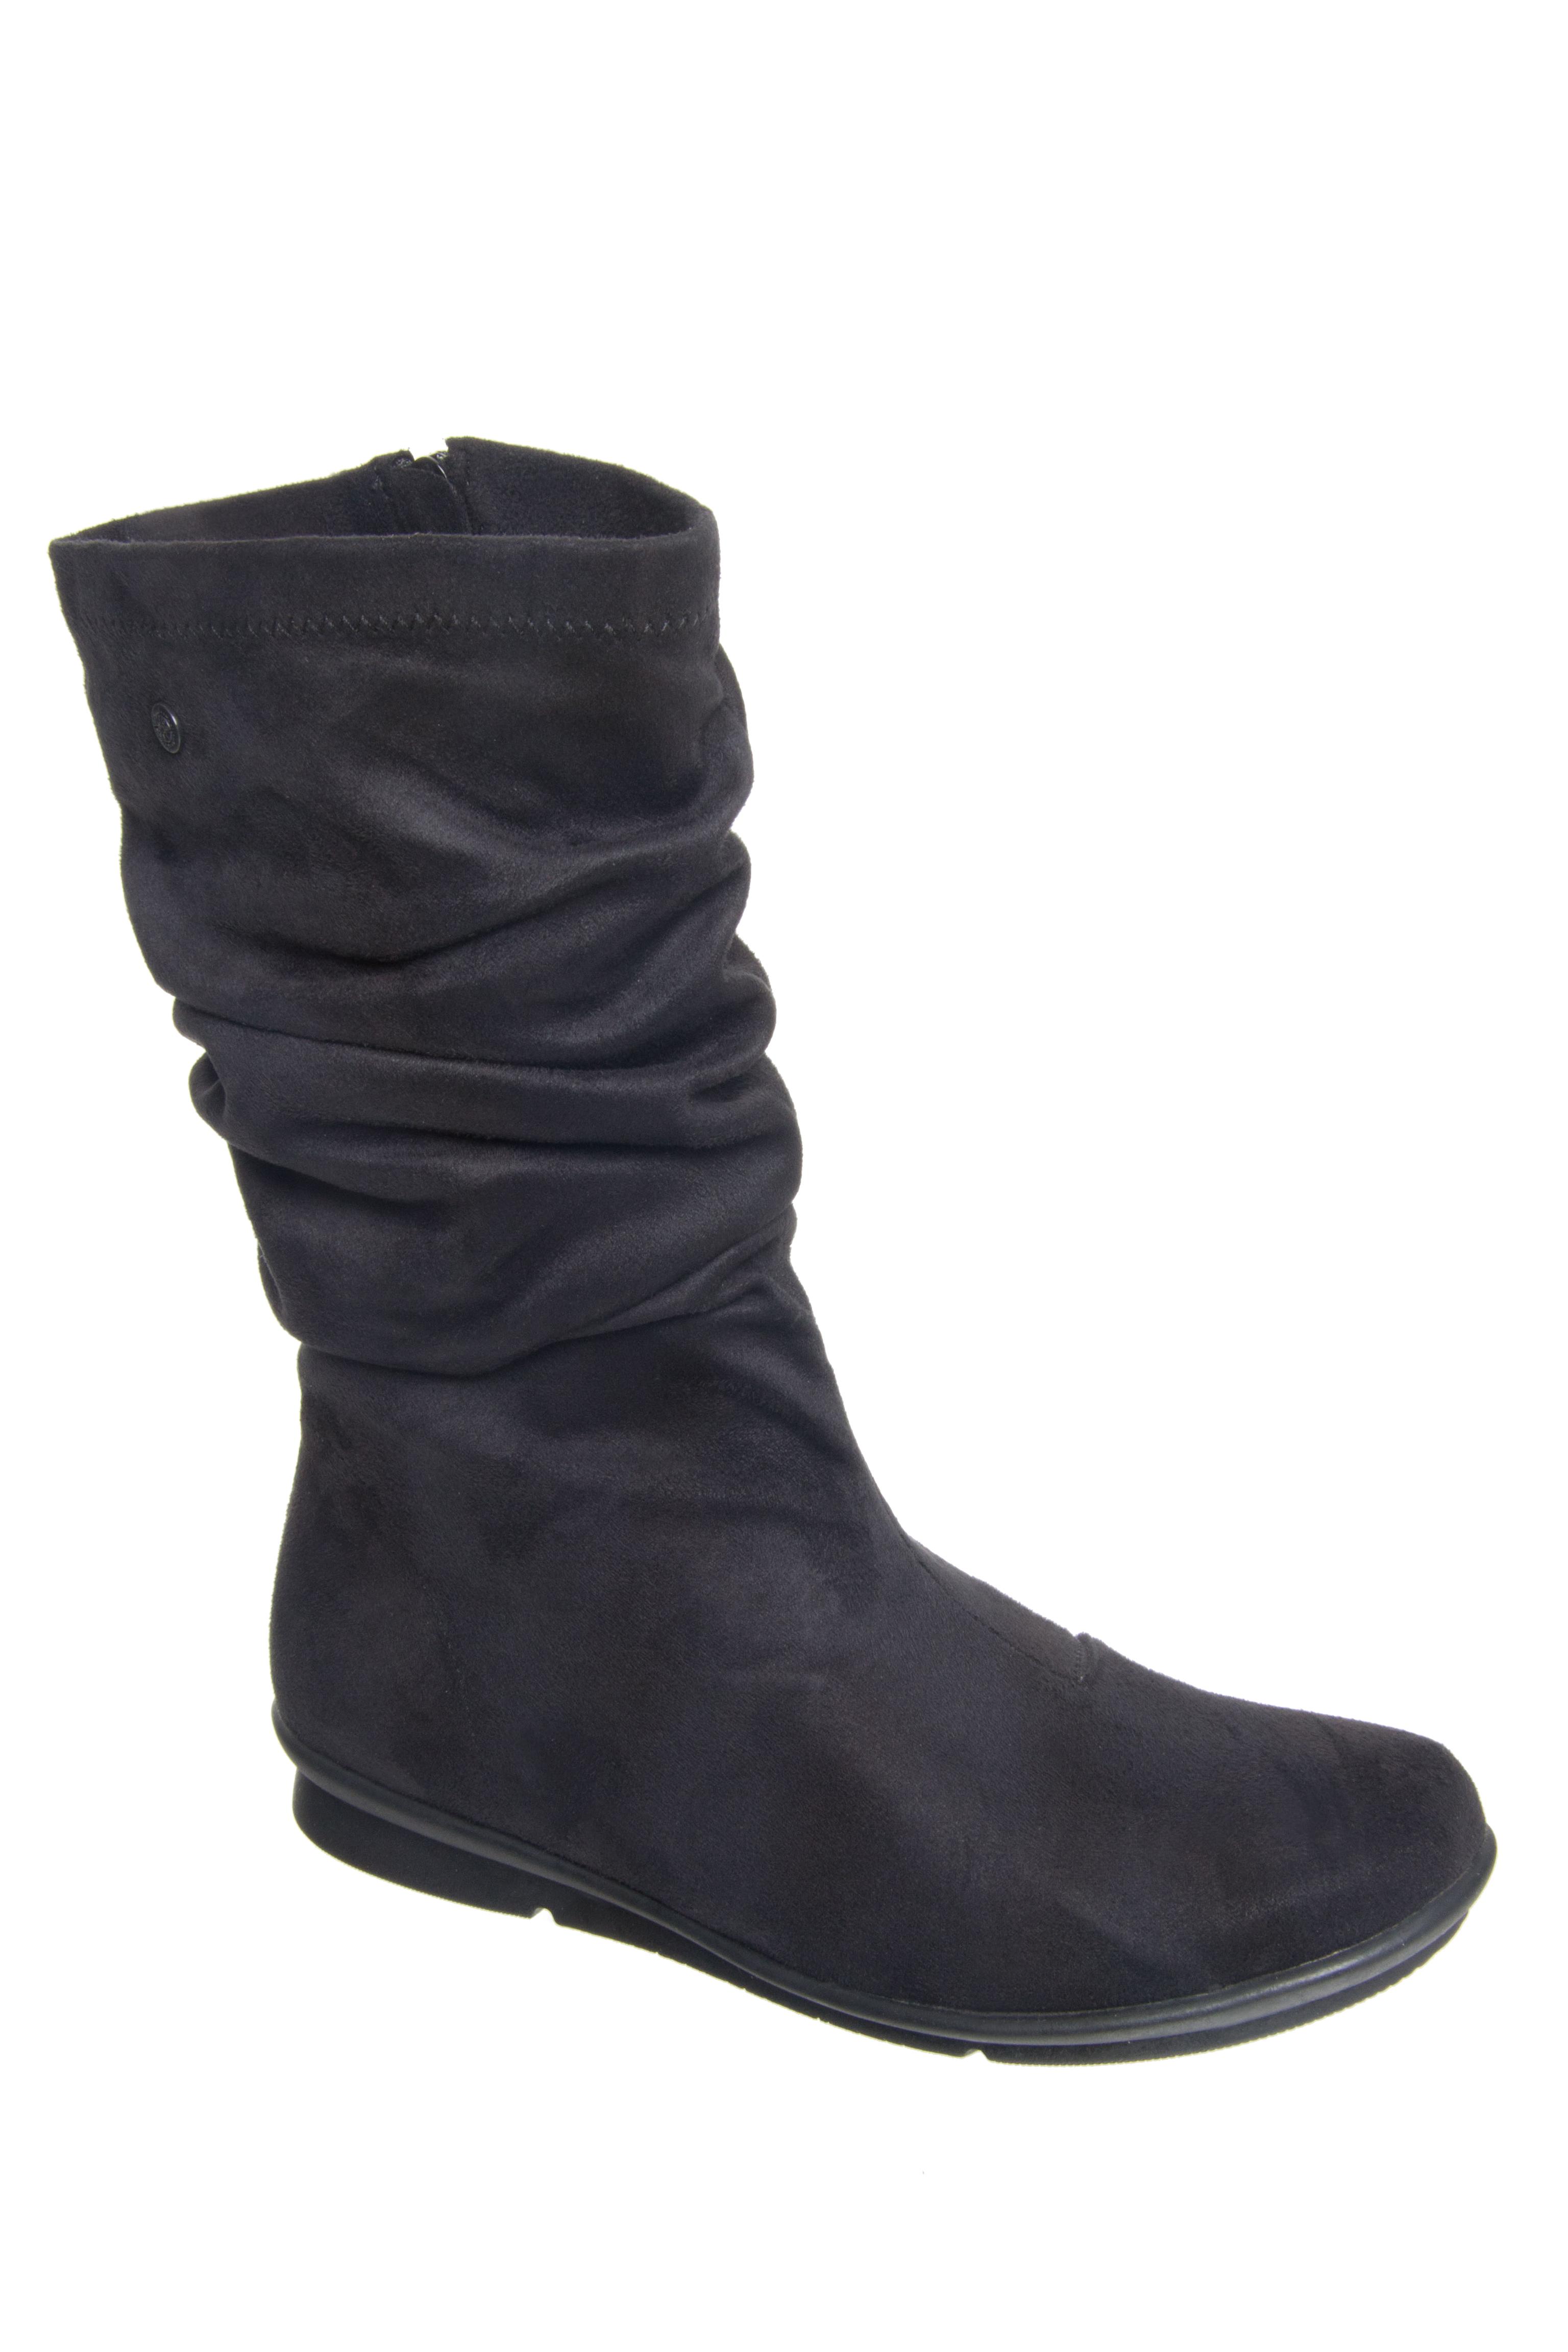 Bussola Cassy Mid Heel Boots - Black